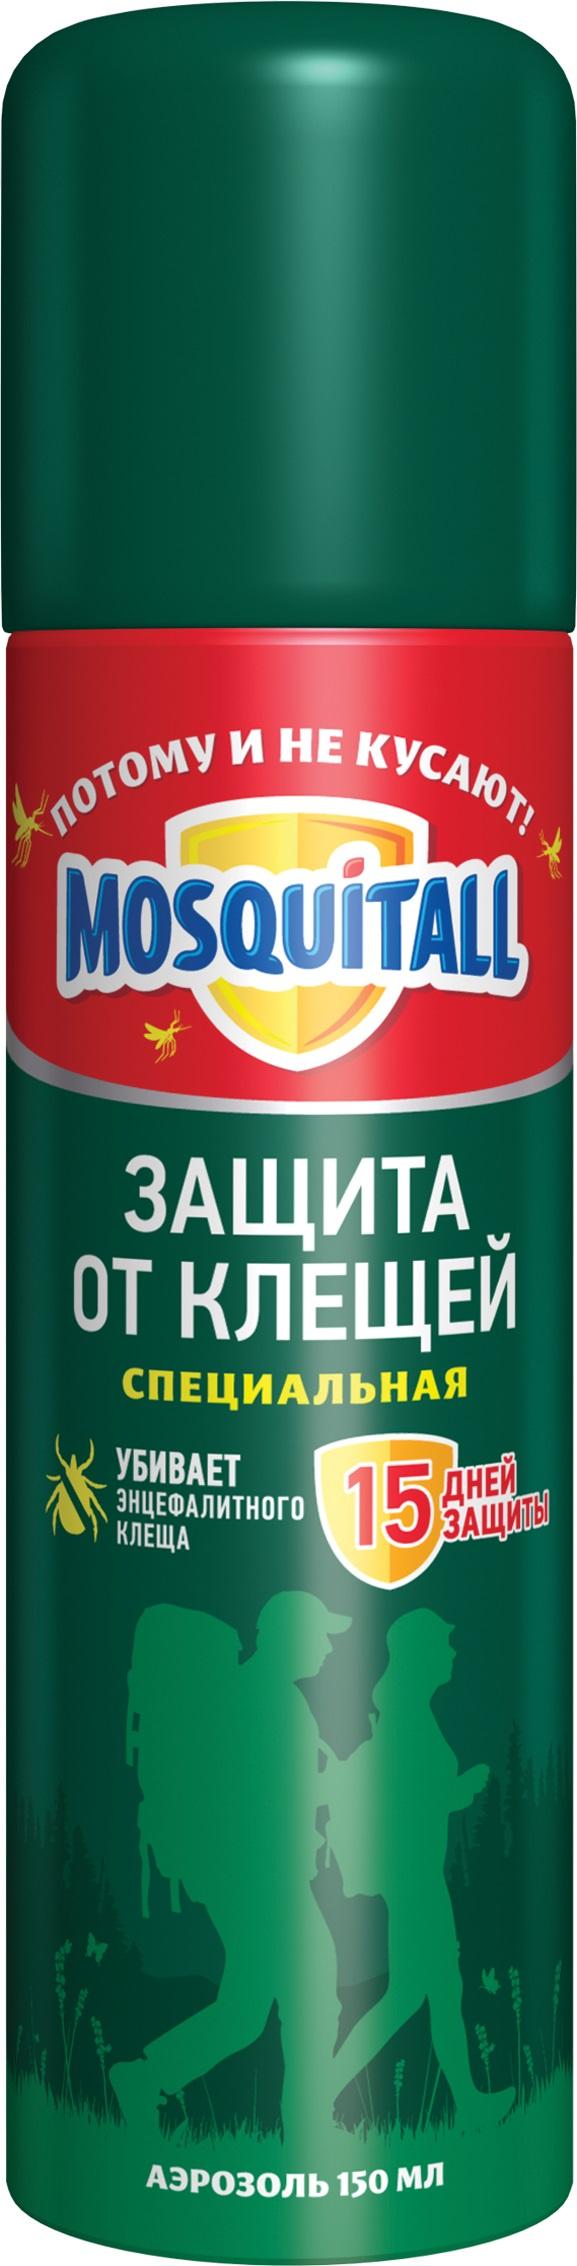 Средство от насекомых Mosquitall Защита от клещей, 150 мл средство акарицидное защита от клещей super picnic 125 мл